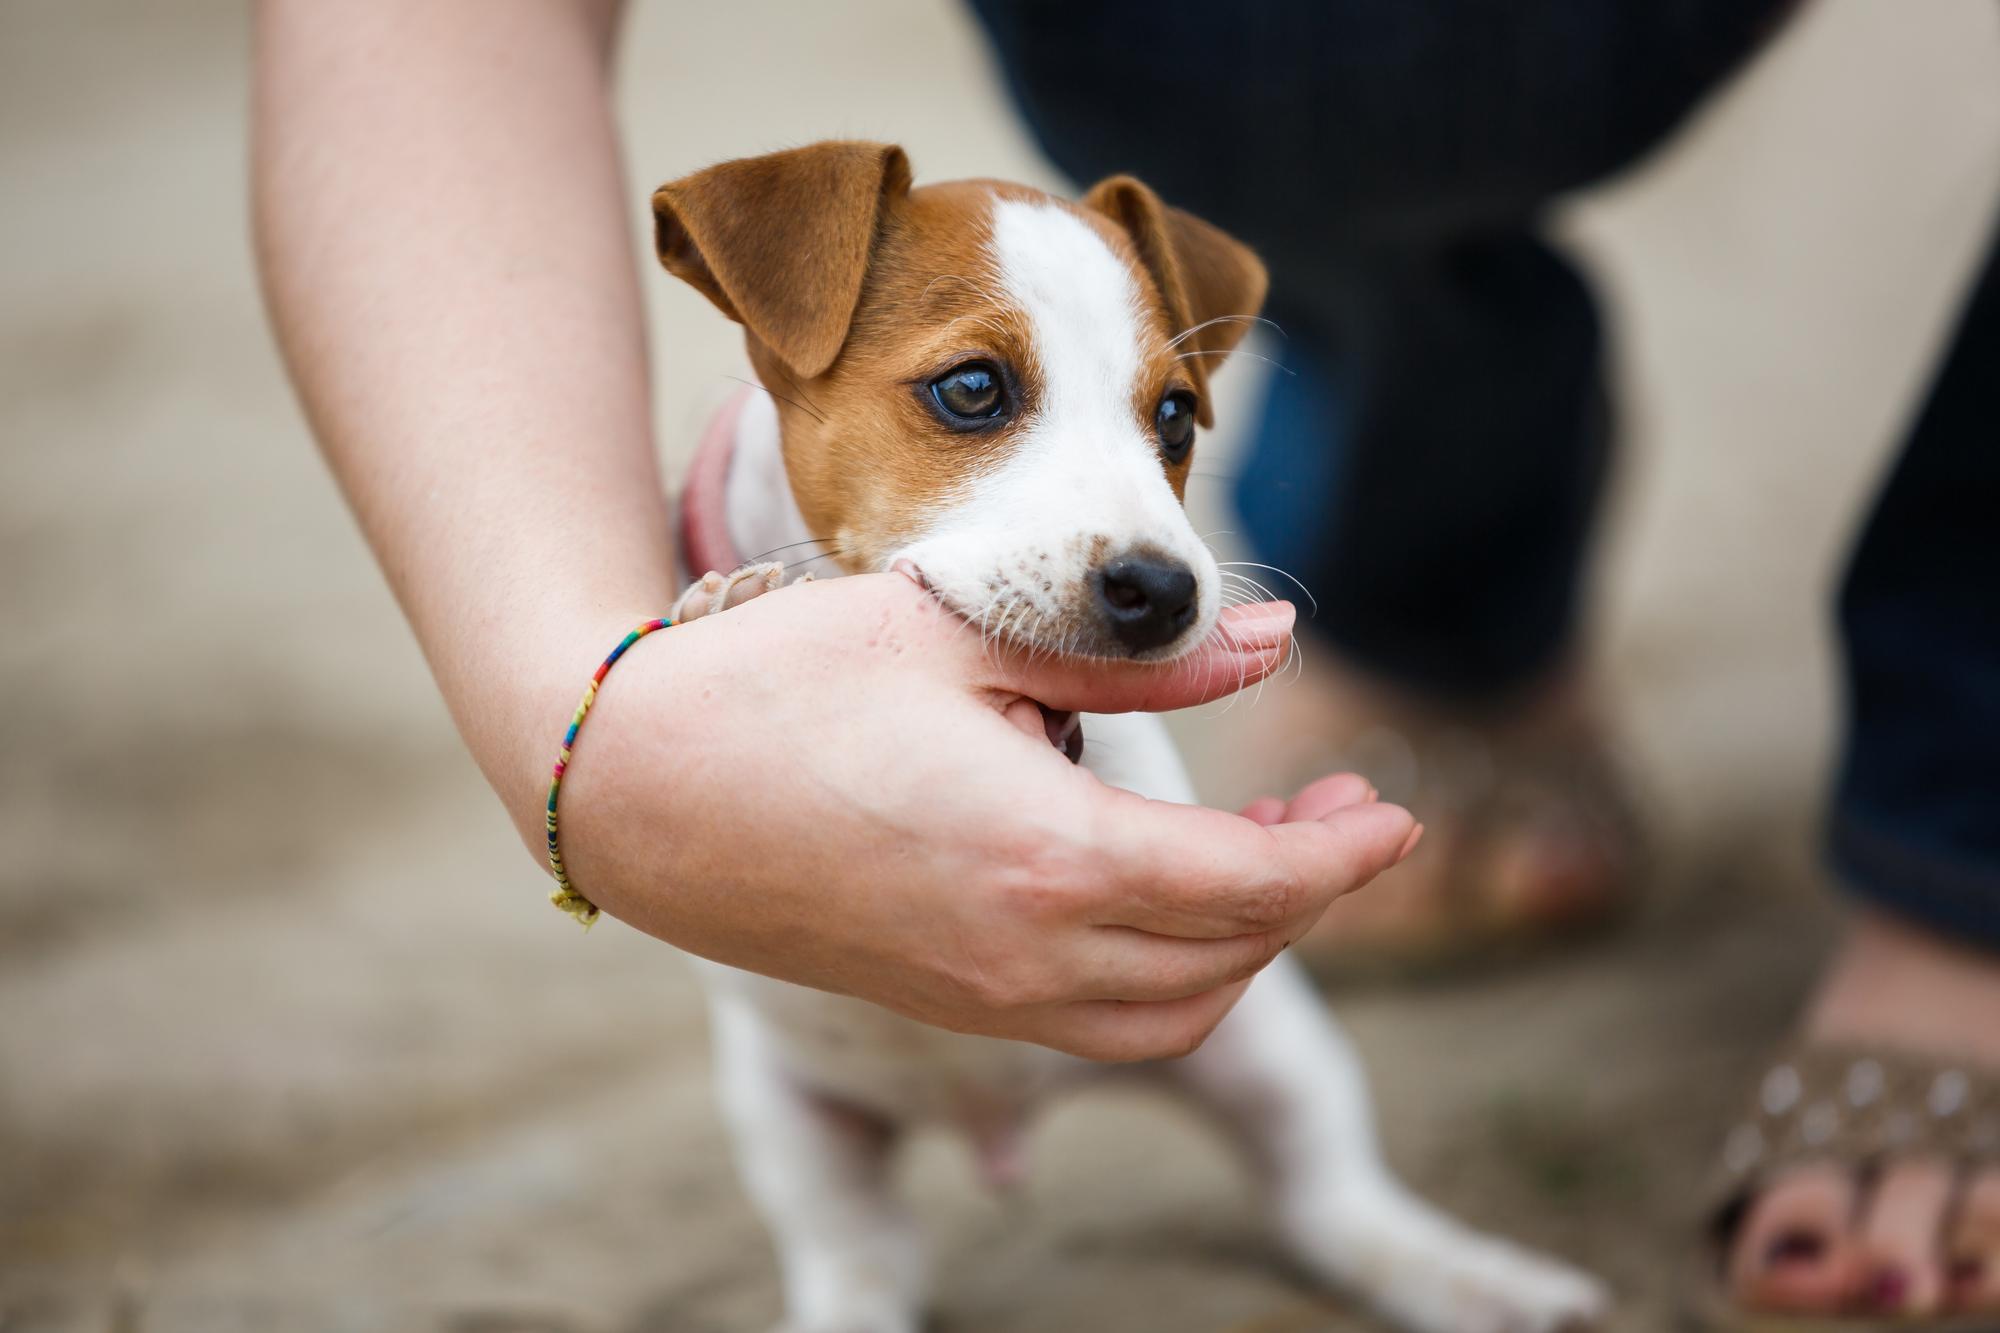 Resultado de imagen para jack russell terrier 犬 遊ぶために